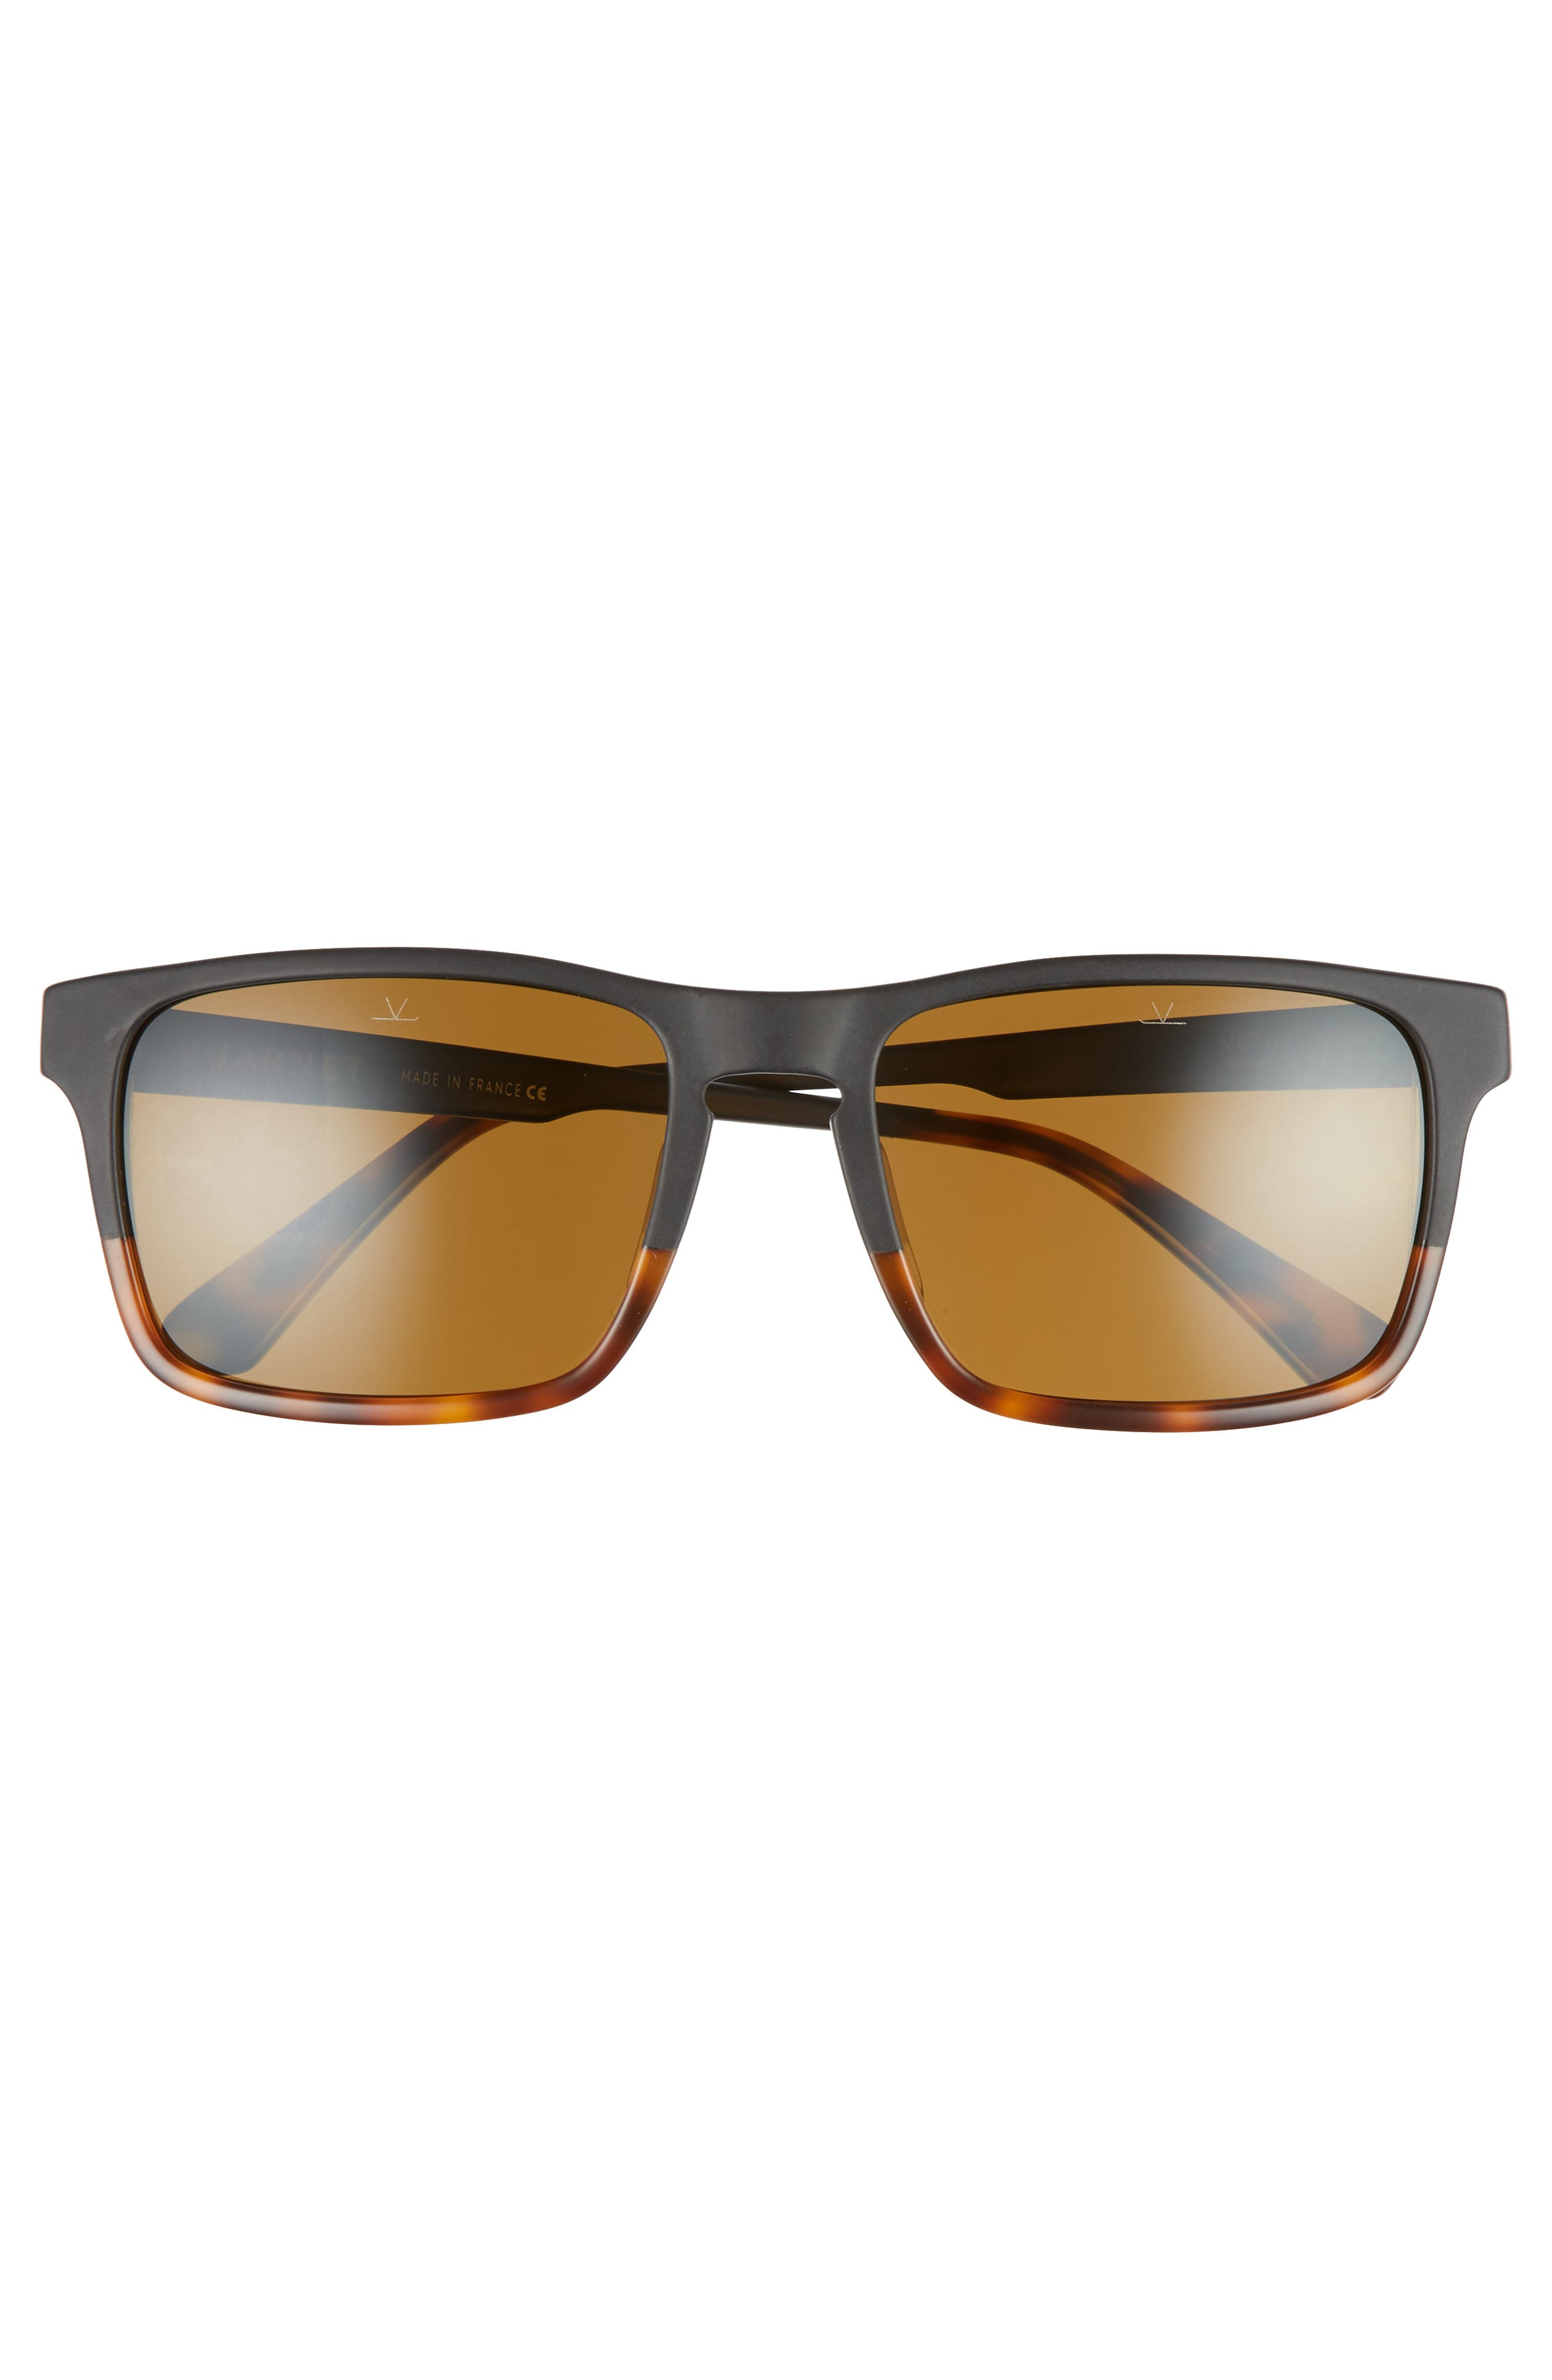 Large District 54mm Sunglasses,                             Alternate thumbnail 2, color,                             Matt Black / Tortoise